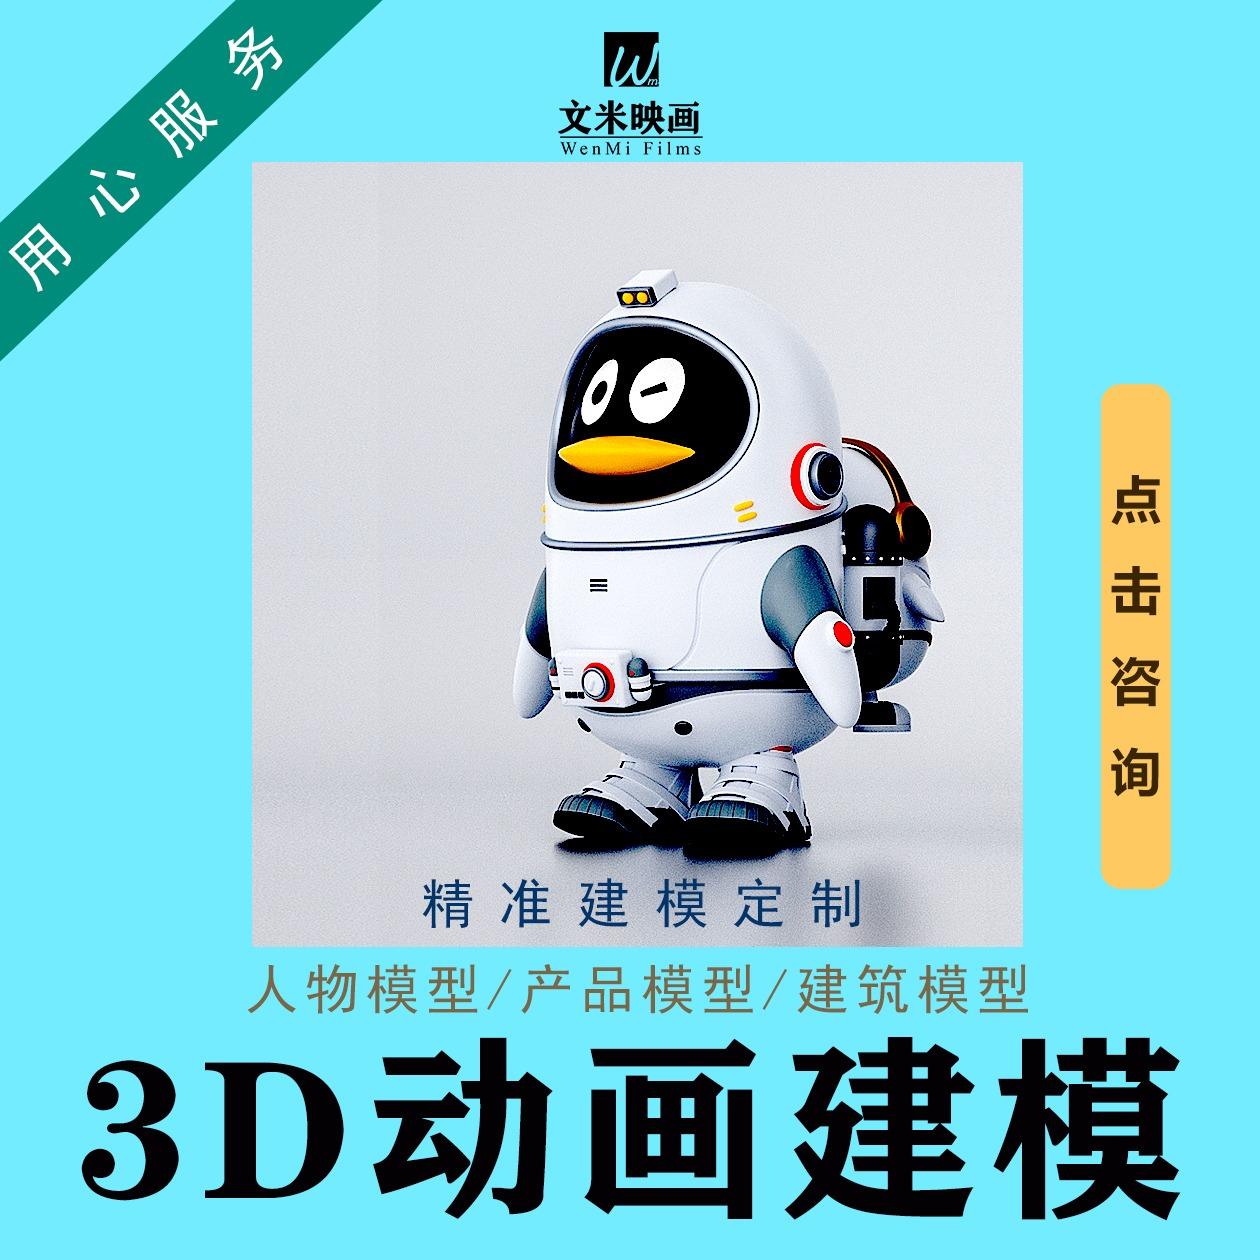 【Maya】三维3D建模人物模型建筑模型产品模型